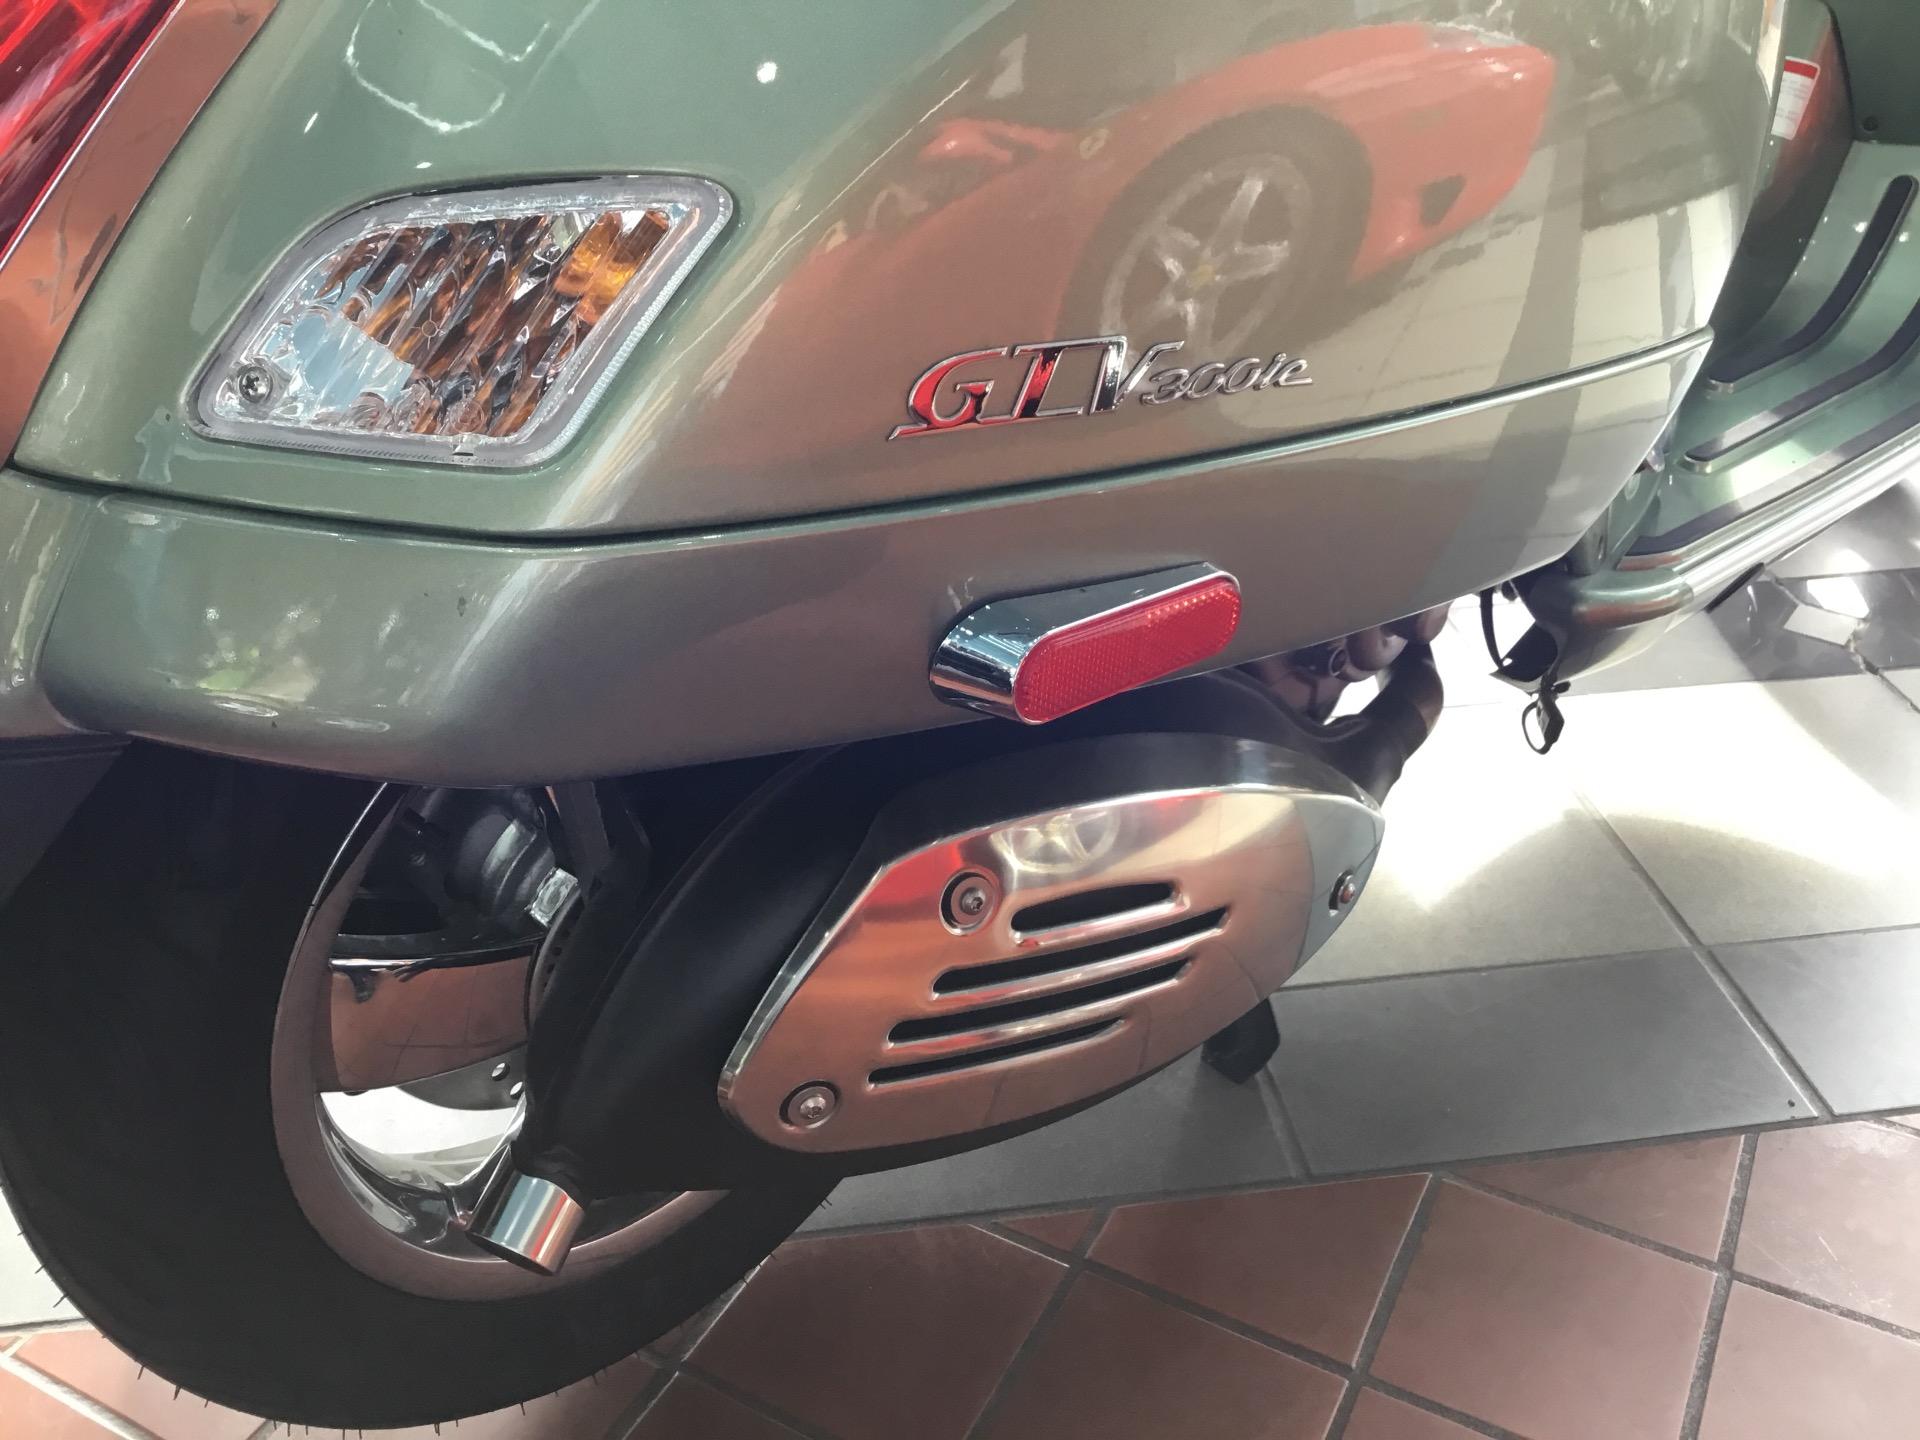 New-2017-Vespa-GTV300